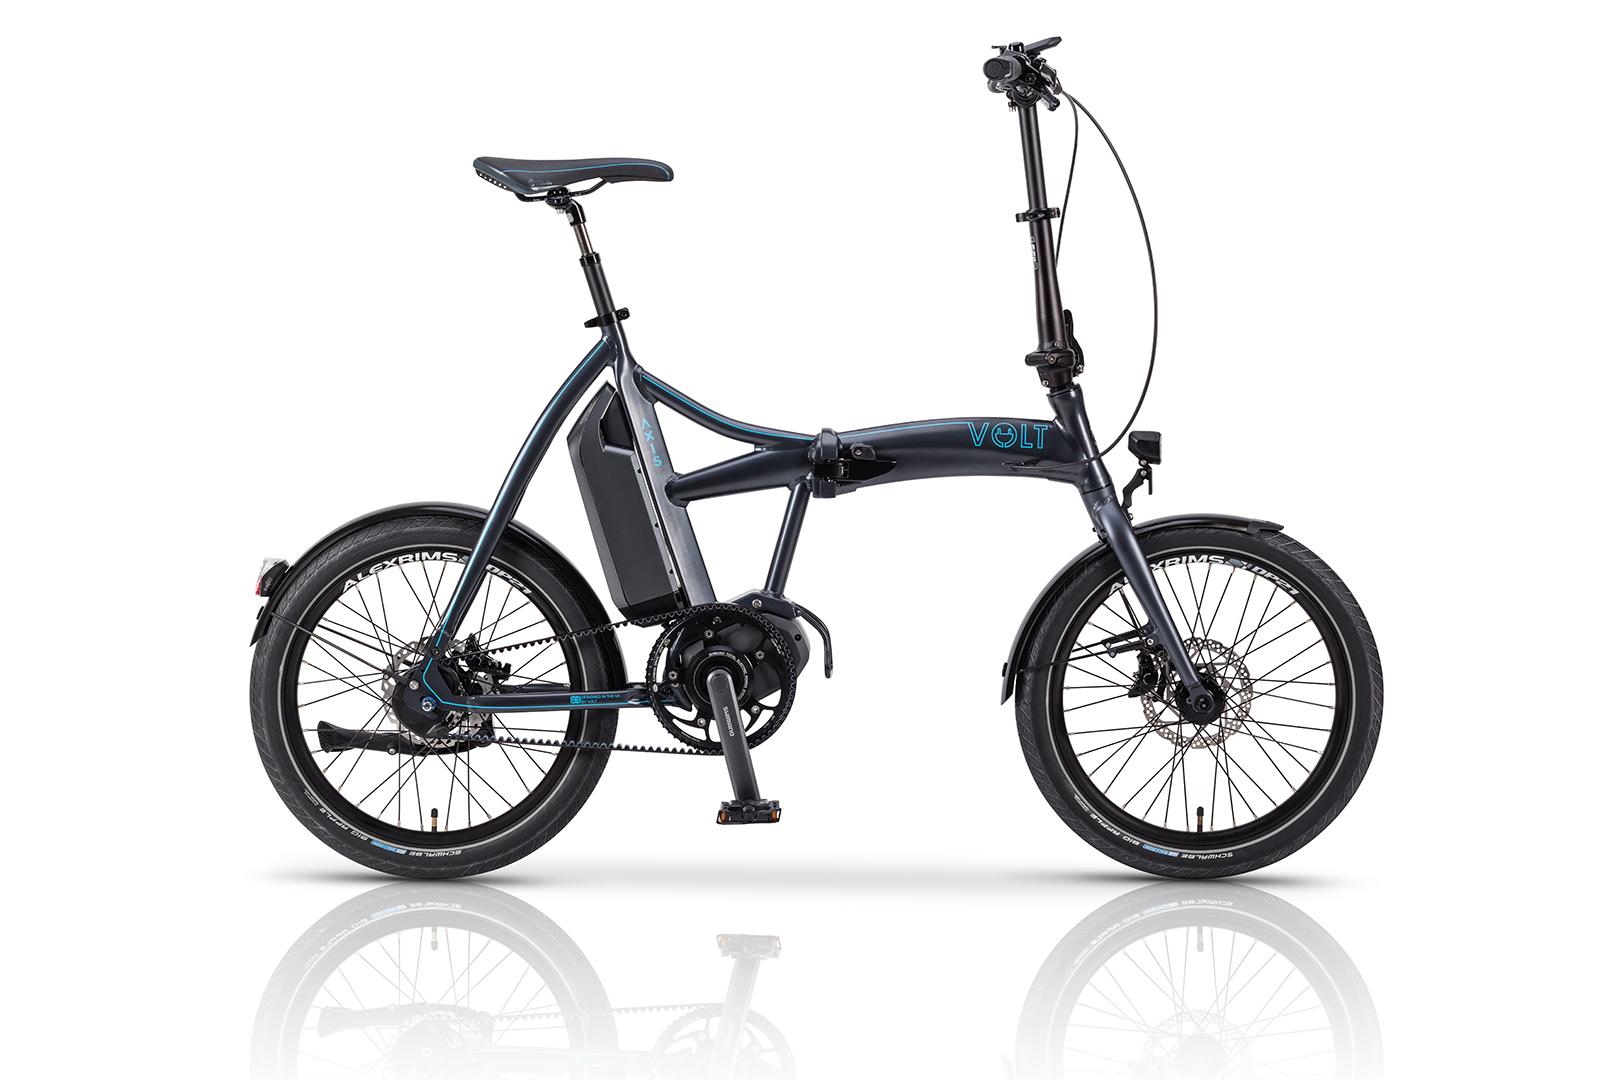 Crank Vs Rear Hub Motor Ebikes